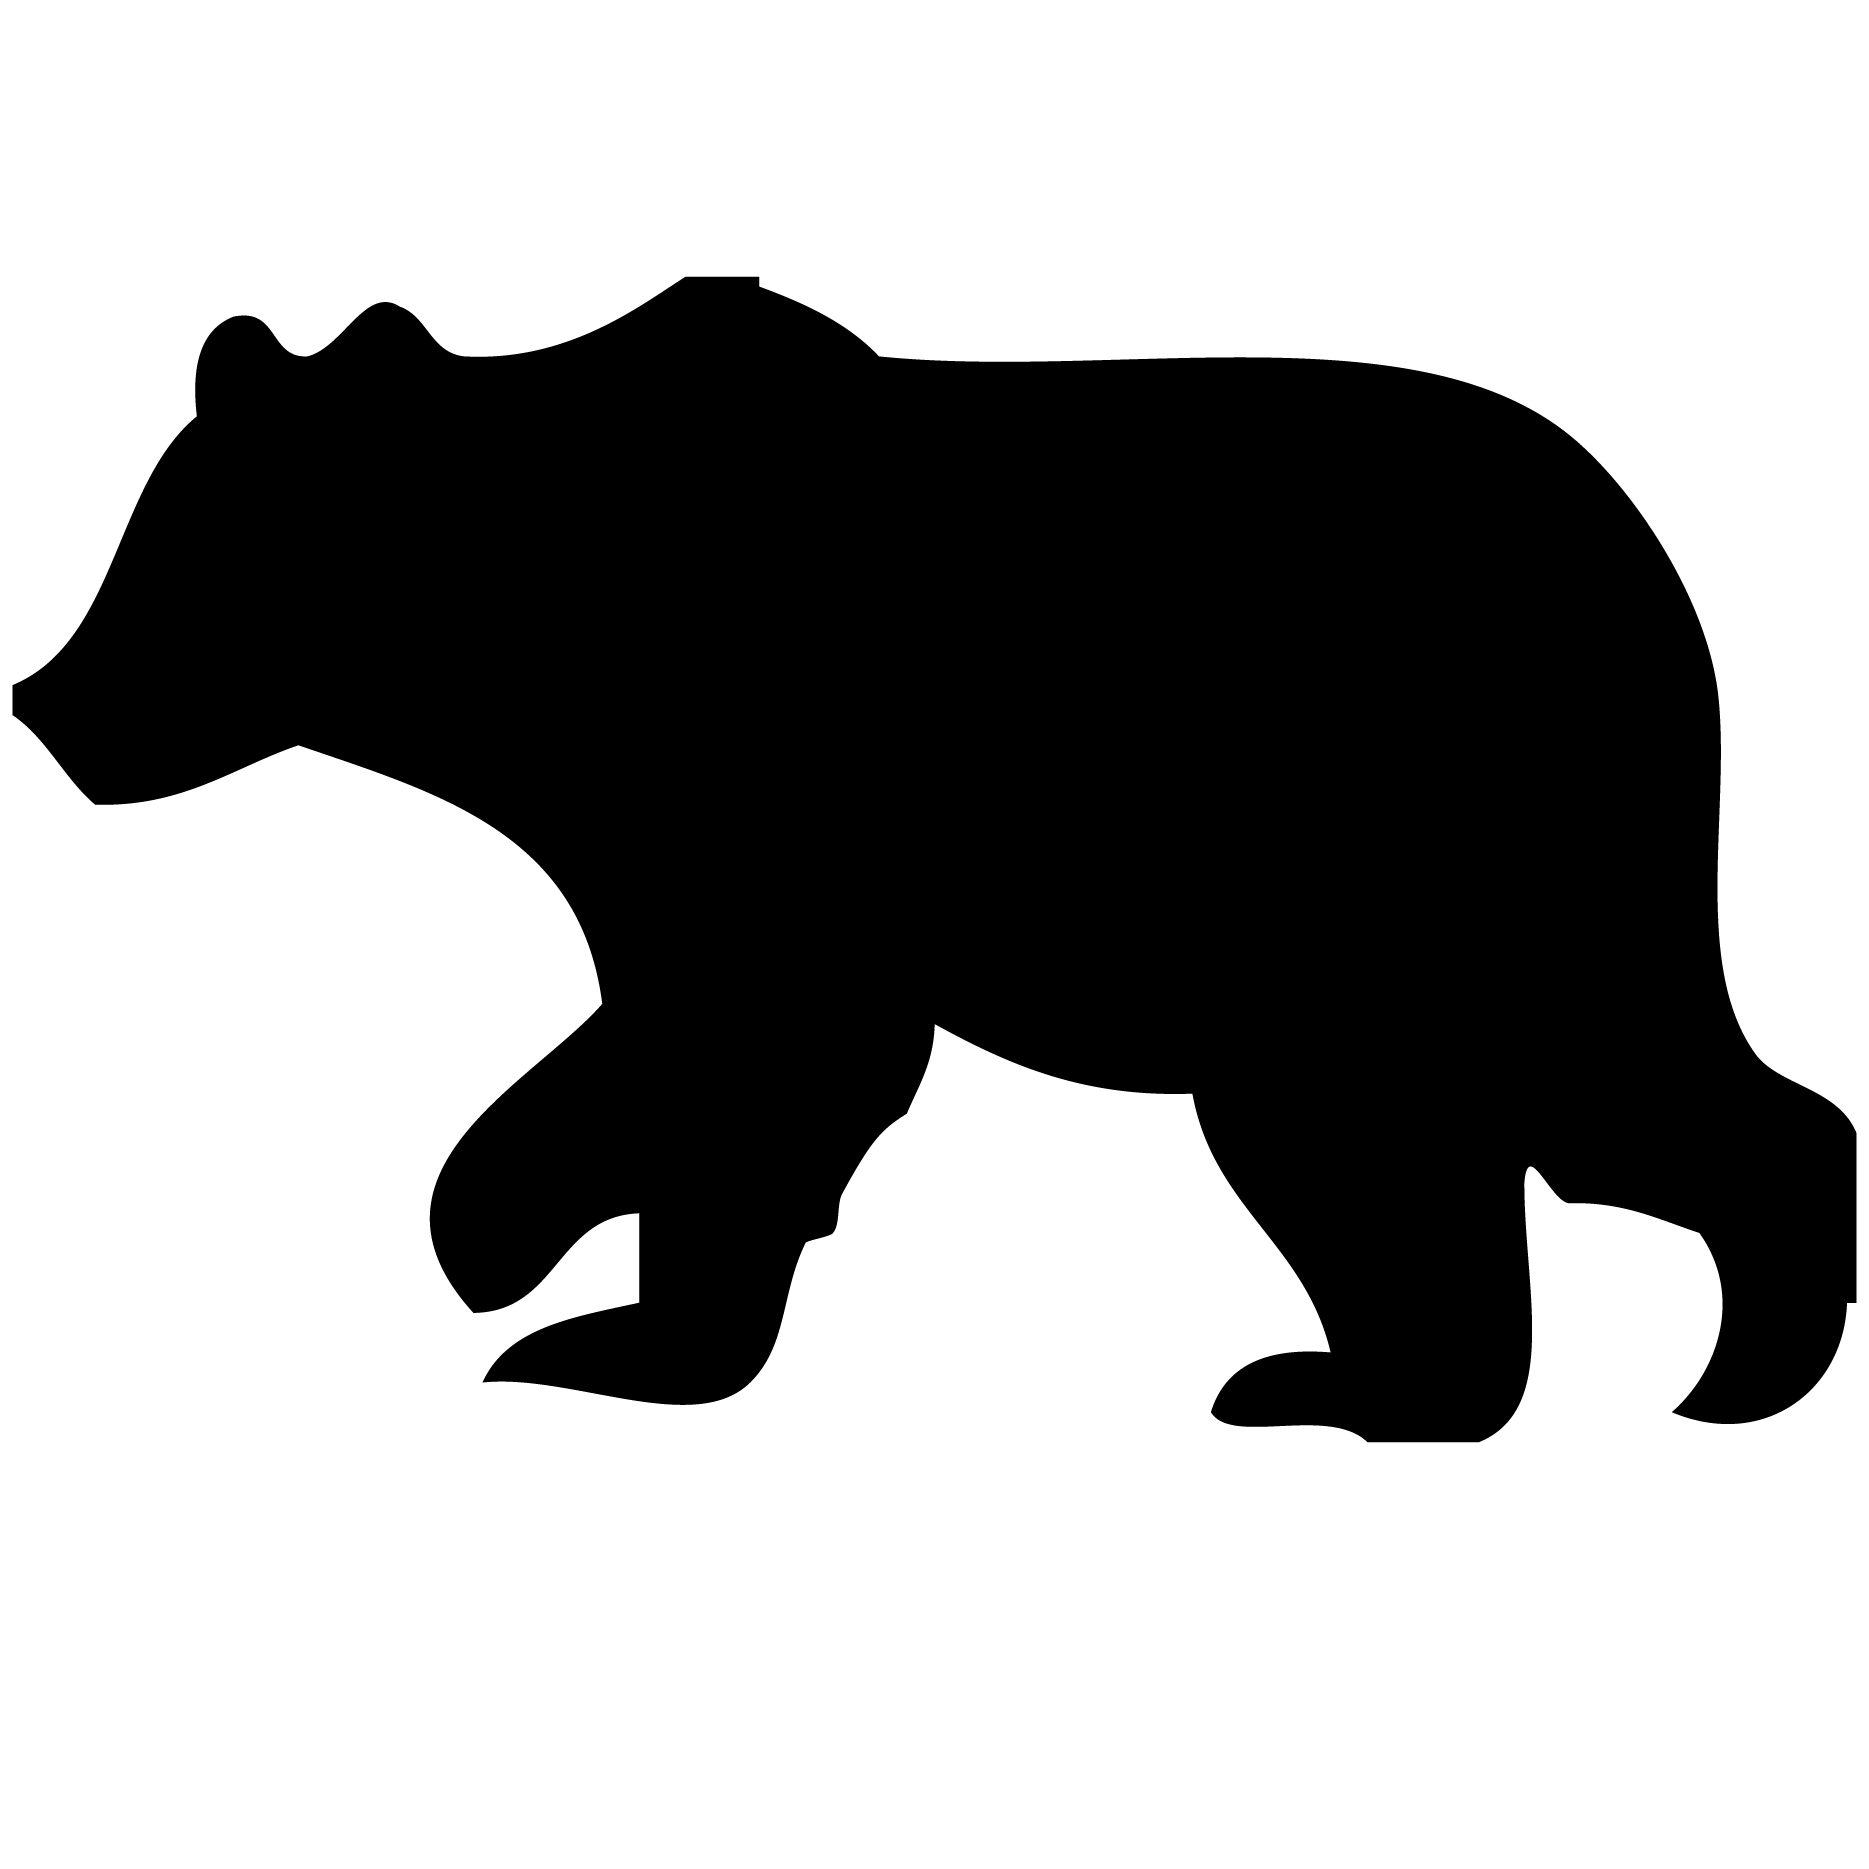 American black bear Polar bear Silhouette Clip art.